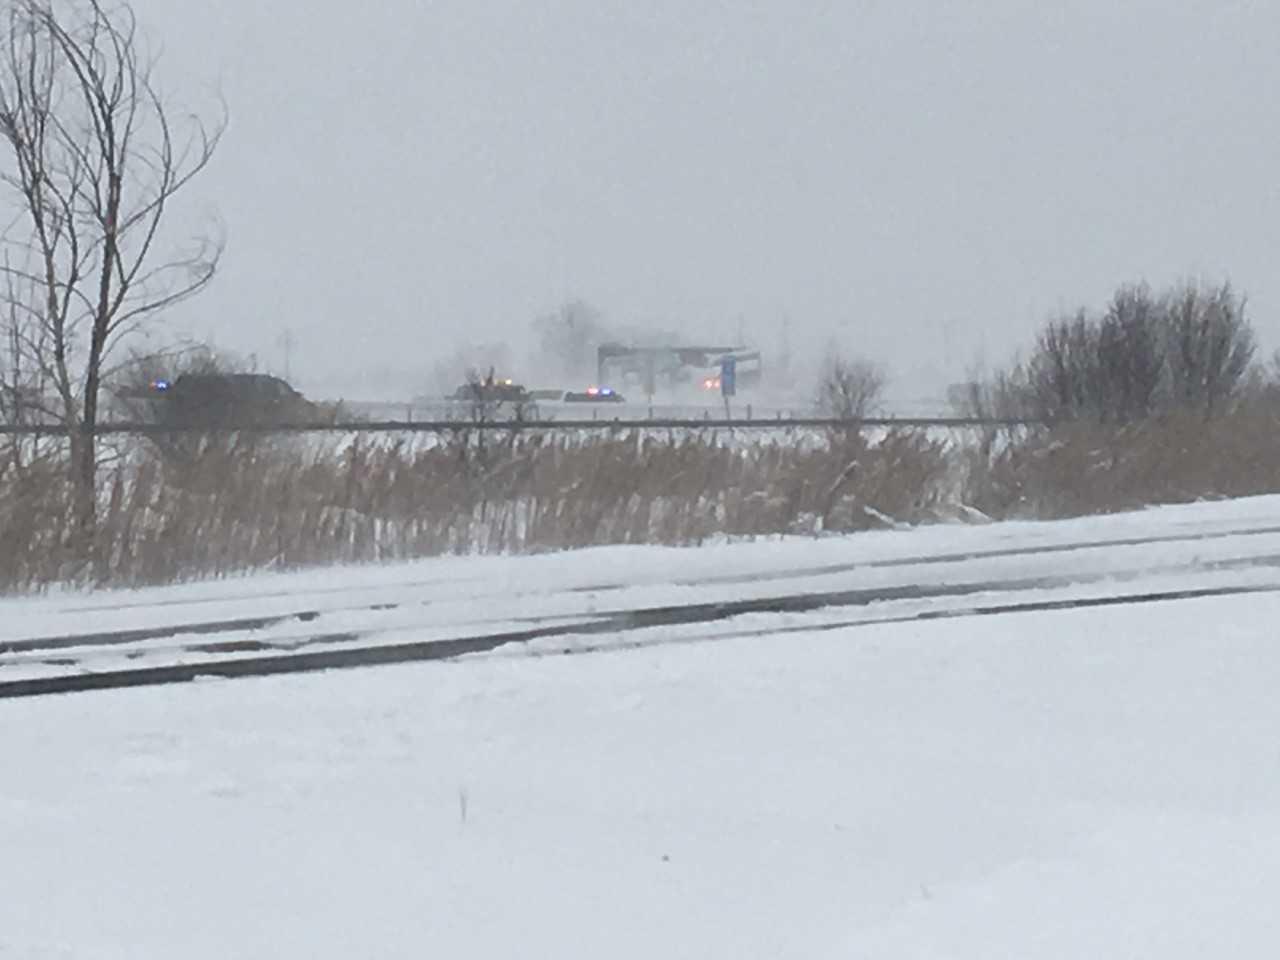 UPDATE: Victim of I-41 Pileup Identified as Iola-Scandinavia